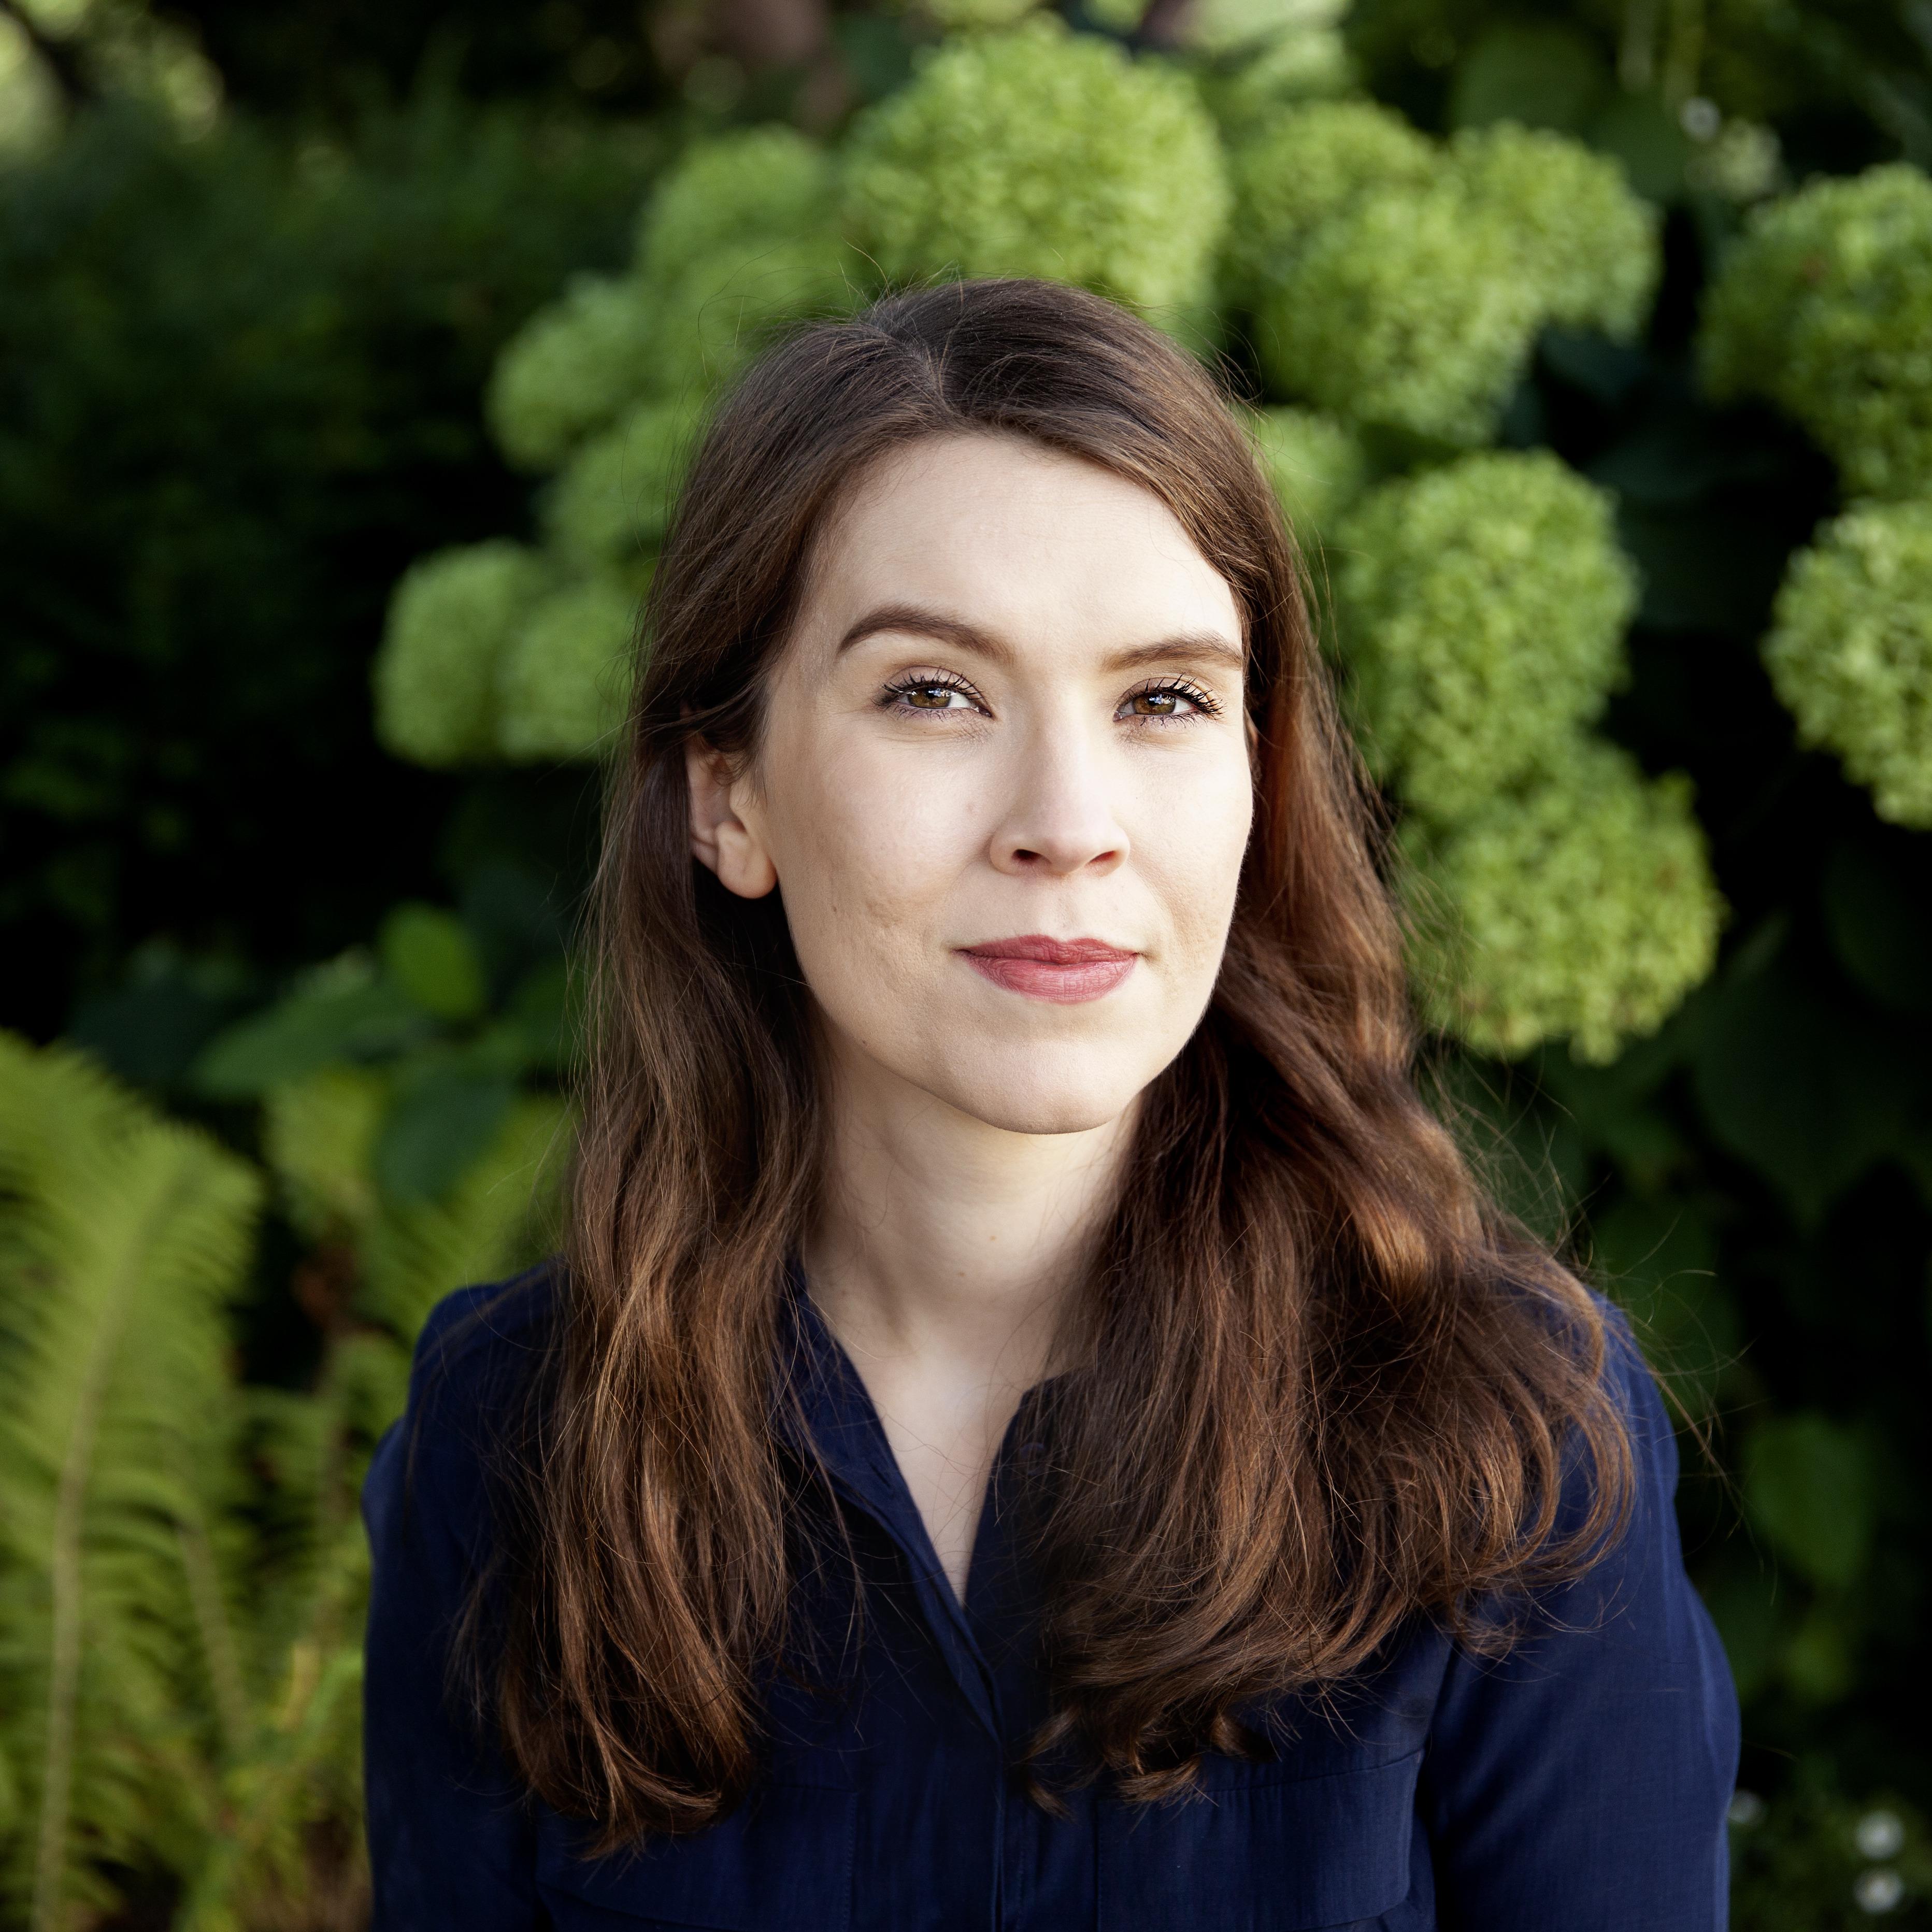 Litteraturfest Røros: Hilsen Ruth – Møt forfatter Ingrid Tørresvold